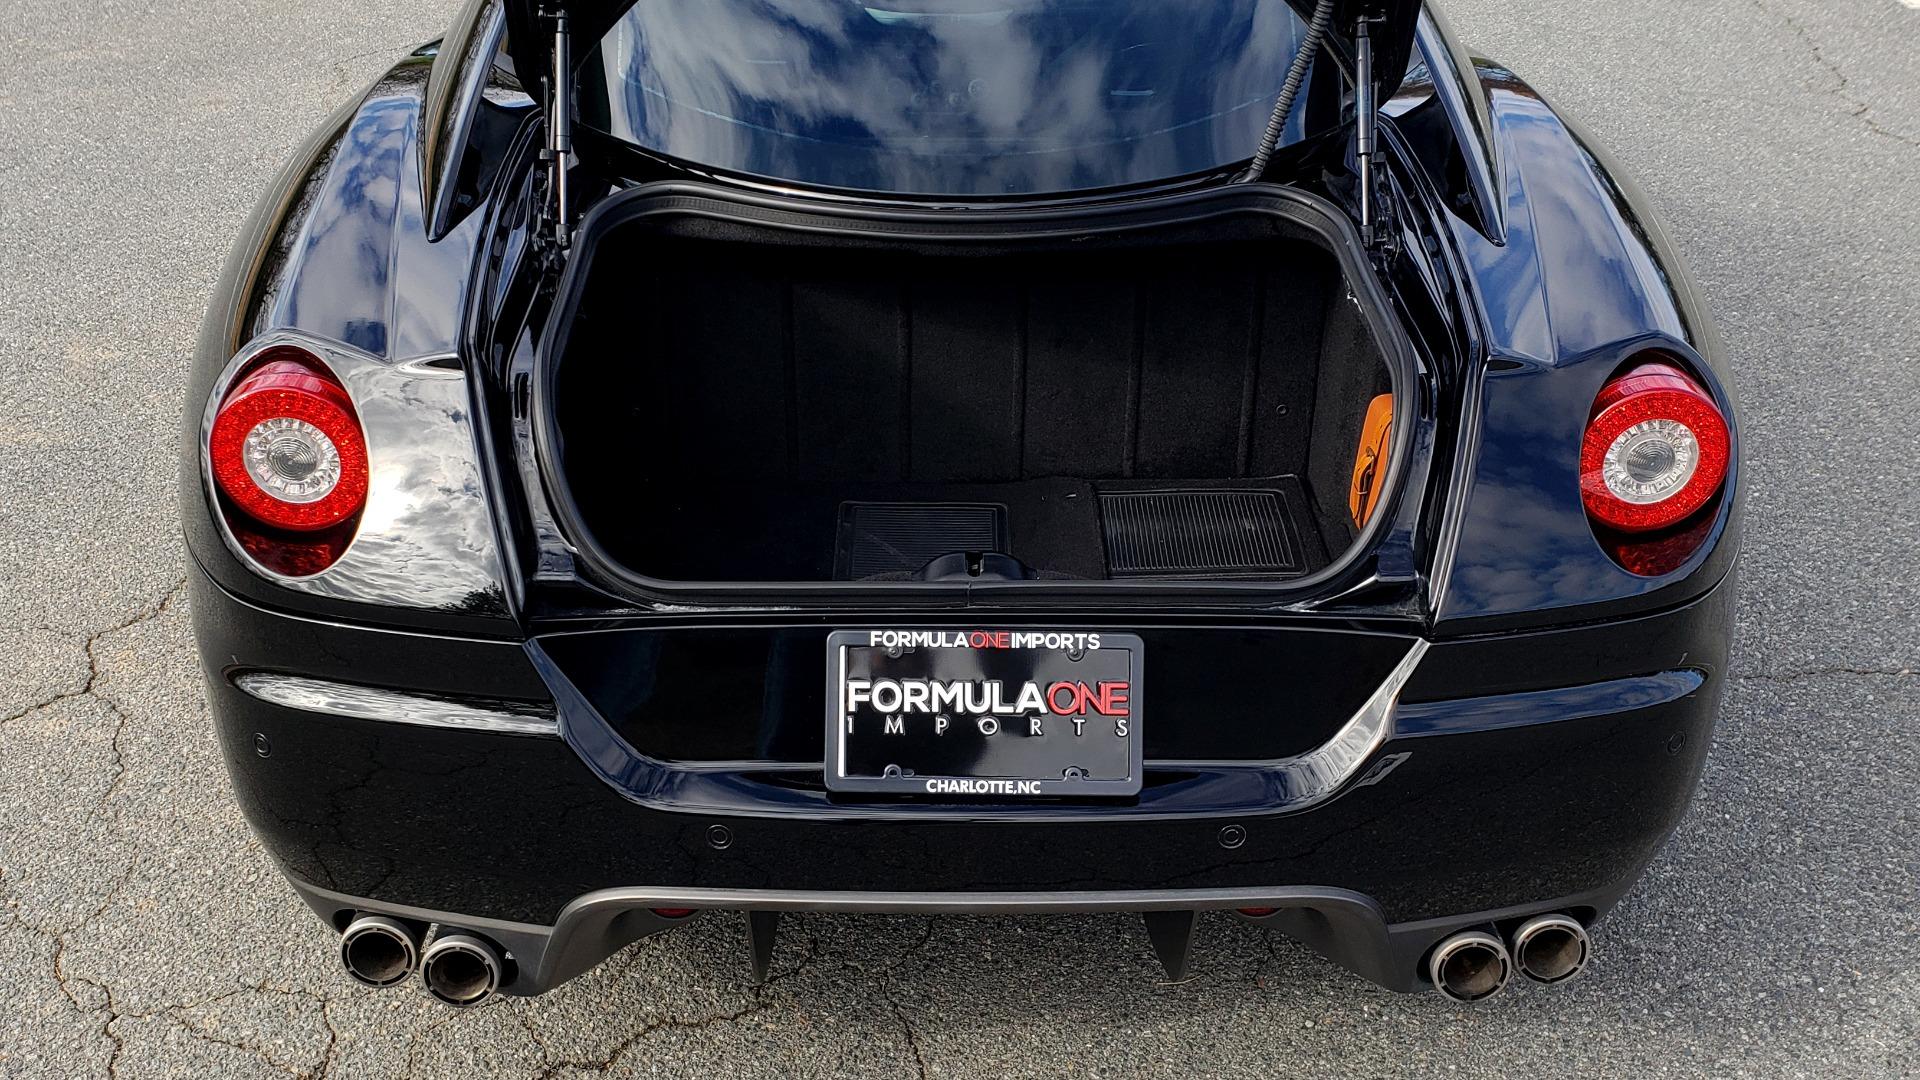 Used 2007 Ferrari 599 GTB FIORANO HGTE / V12 / F1 TRANS / NAV / BOSE / CUSTOM WHEELS for sale $109,999 at Formula Imports in Charlotte NC 28227 68